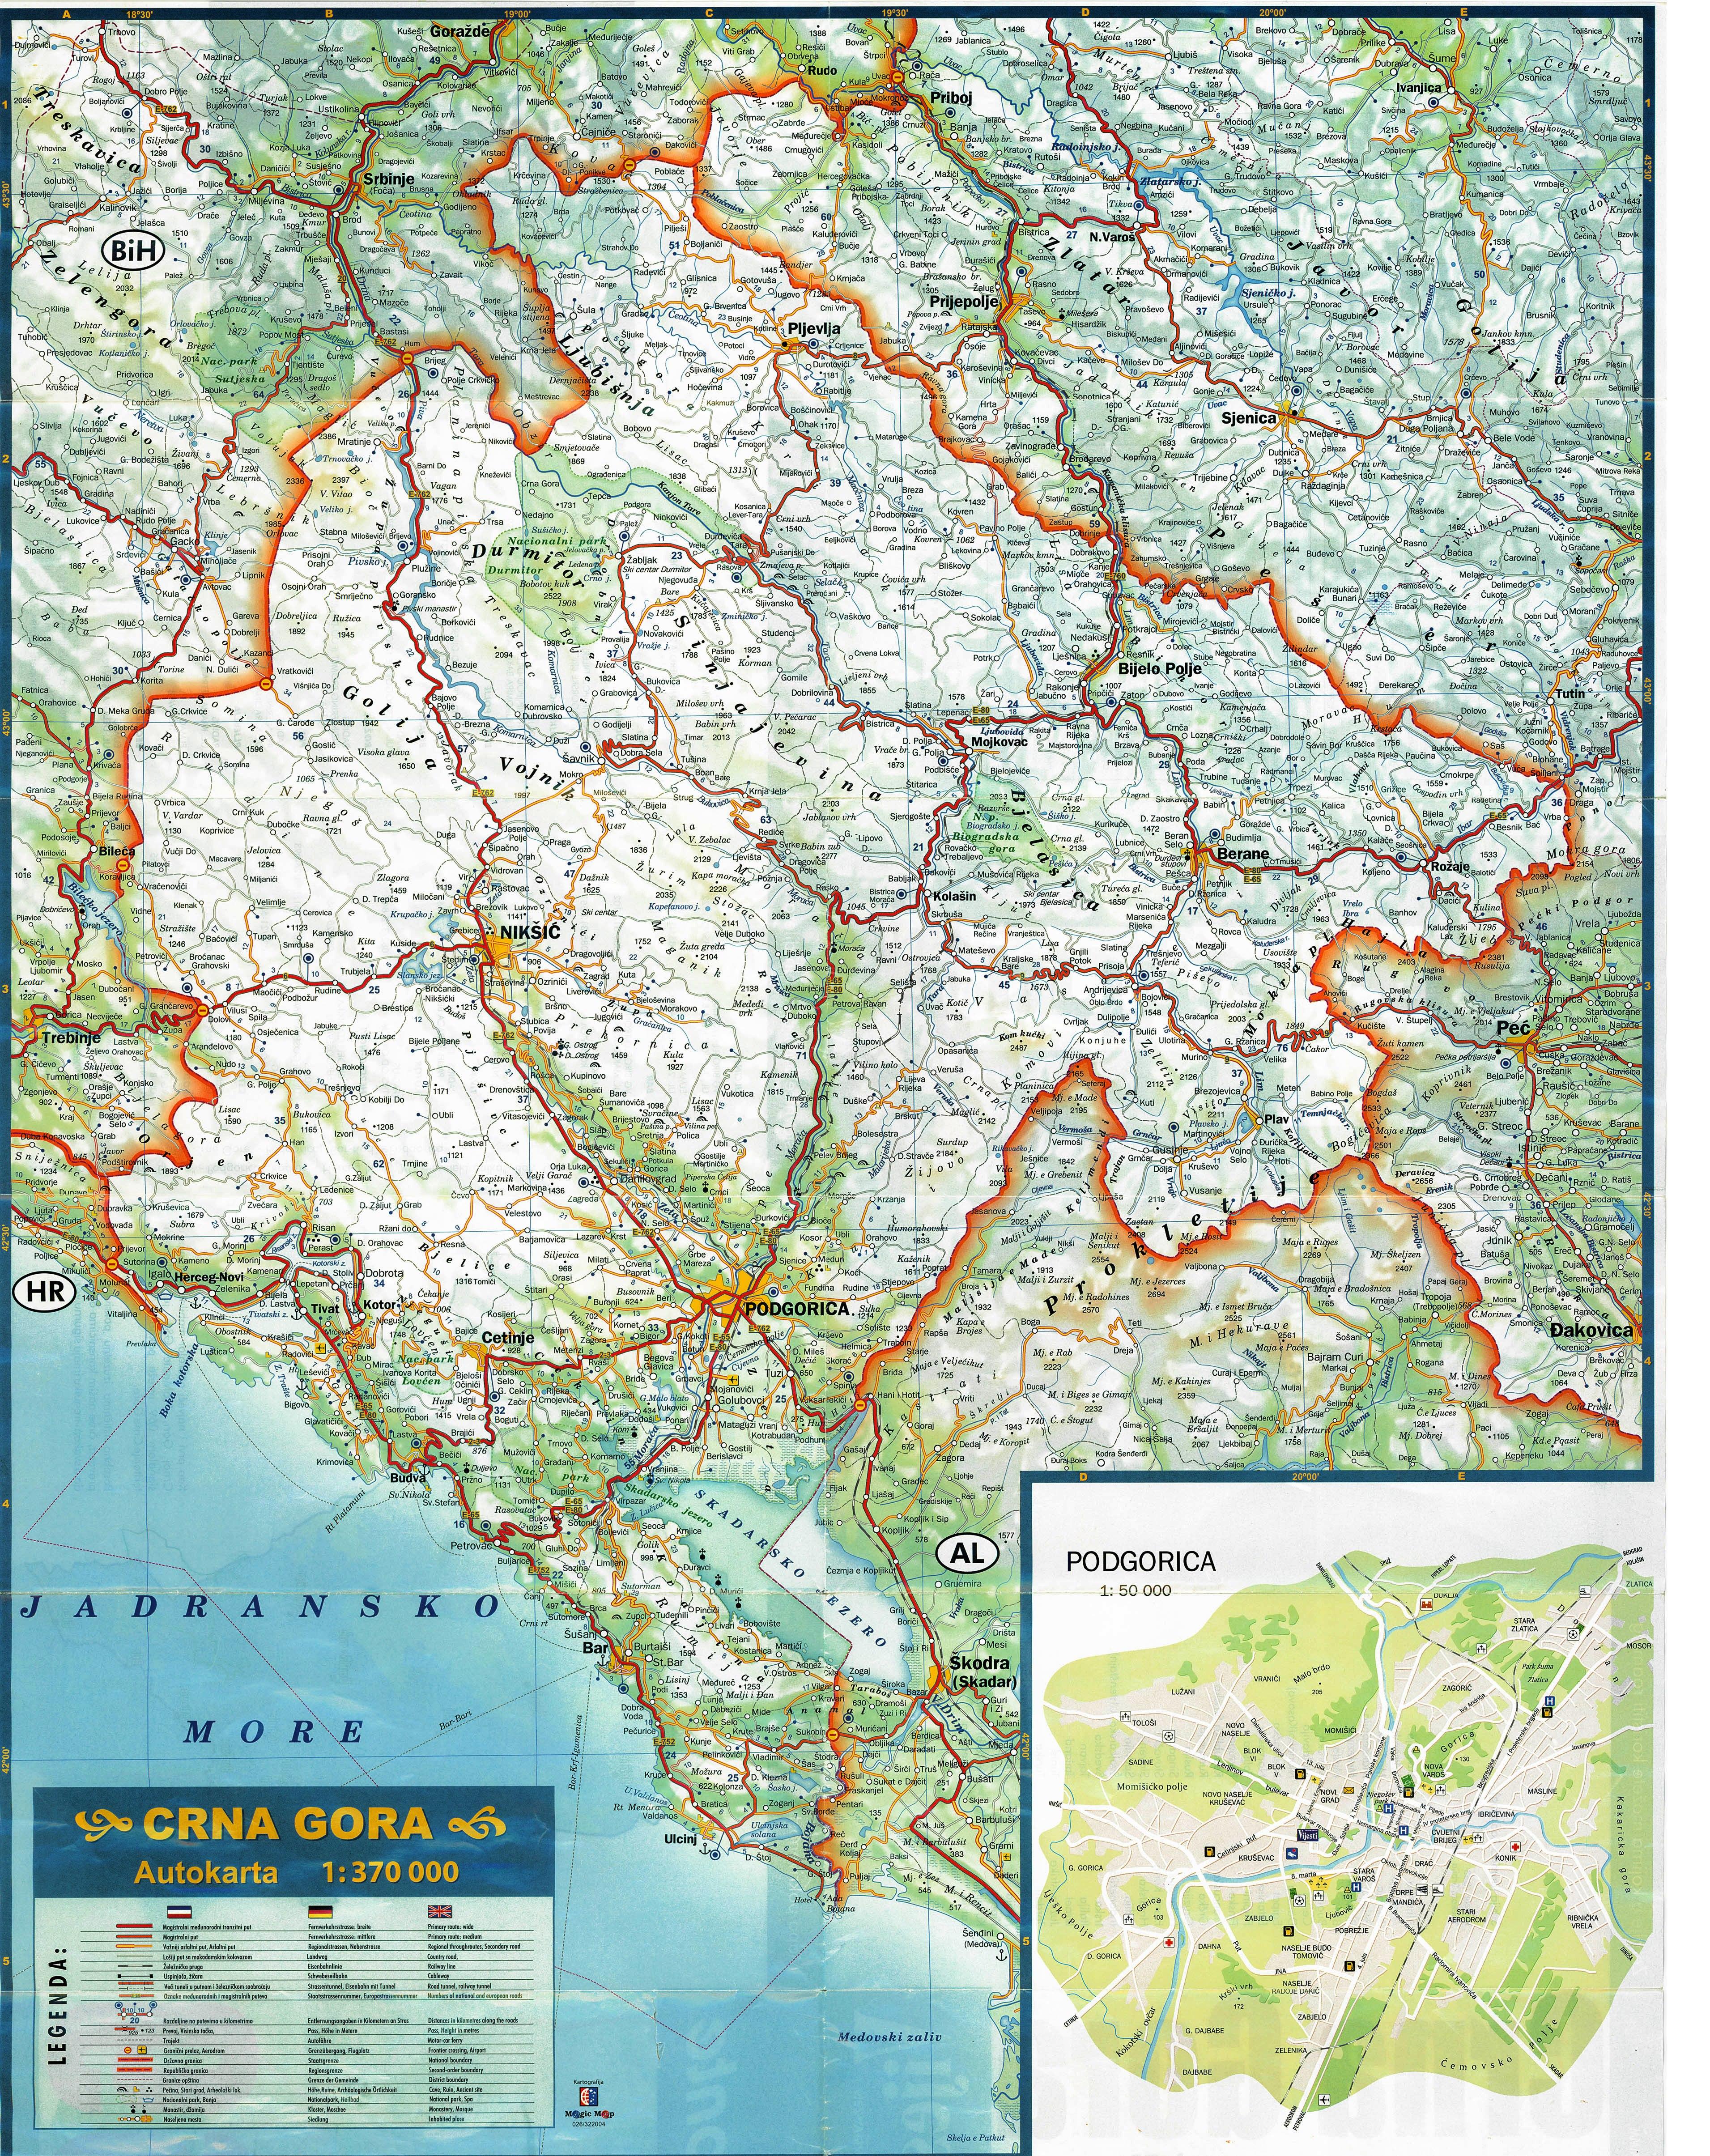 crna gora turisticka mapa Travel agency Adria Line DMC Montenegro   Visit Montenegro crna gora turisticka mapa